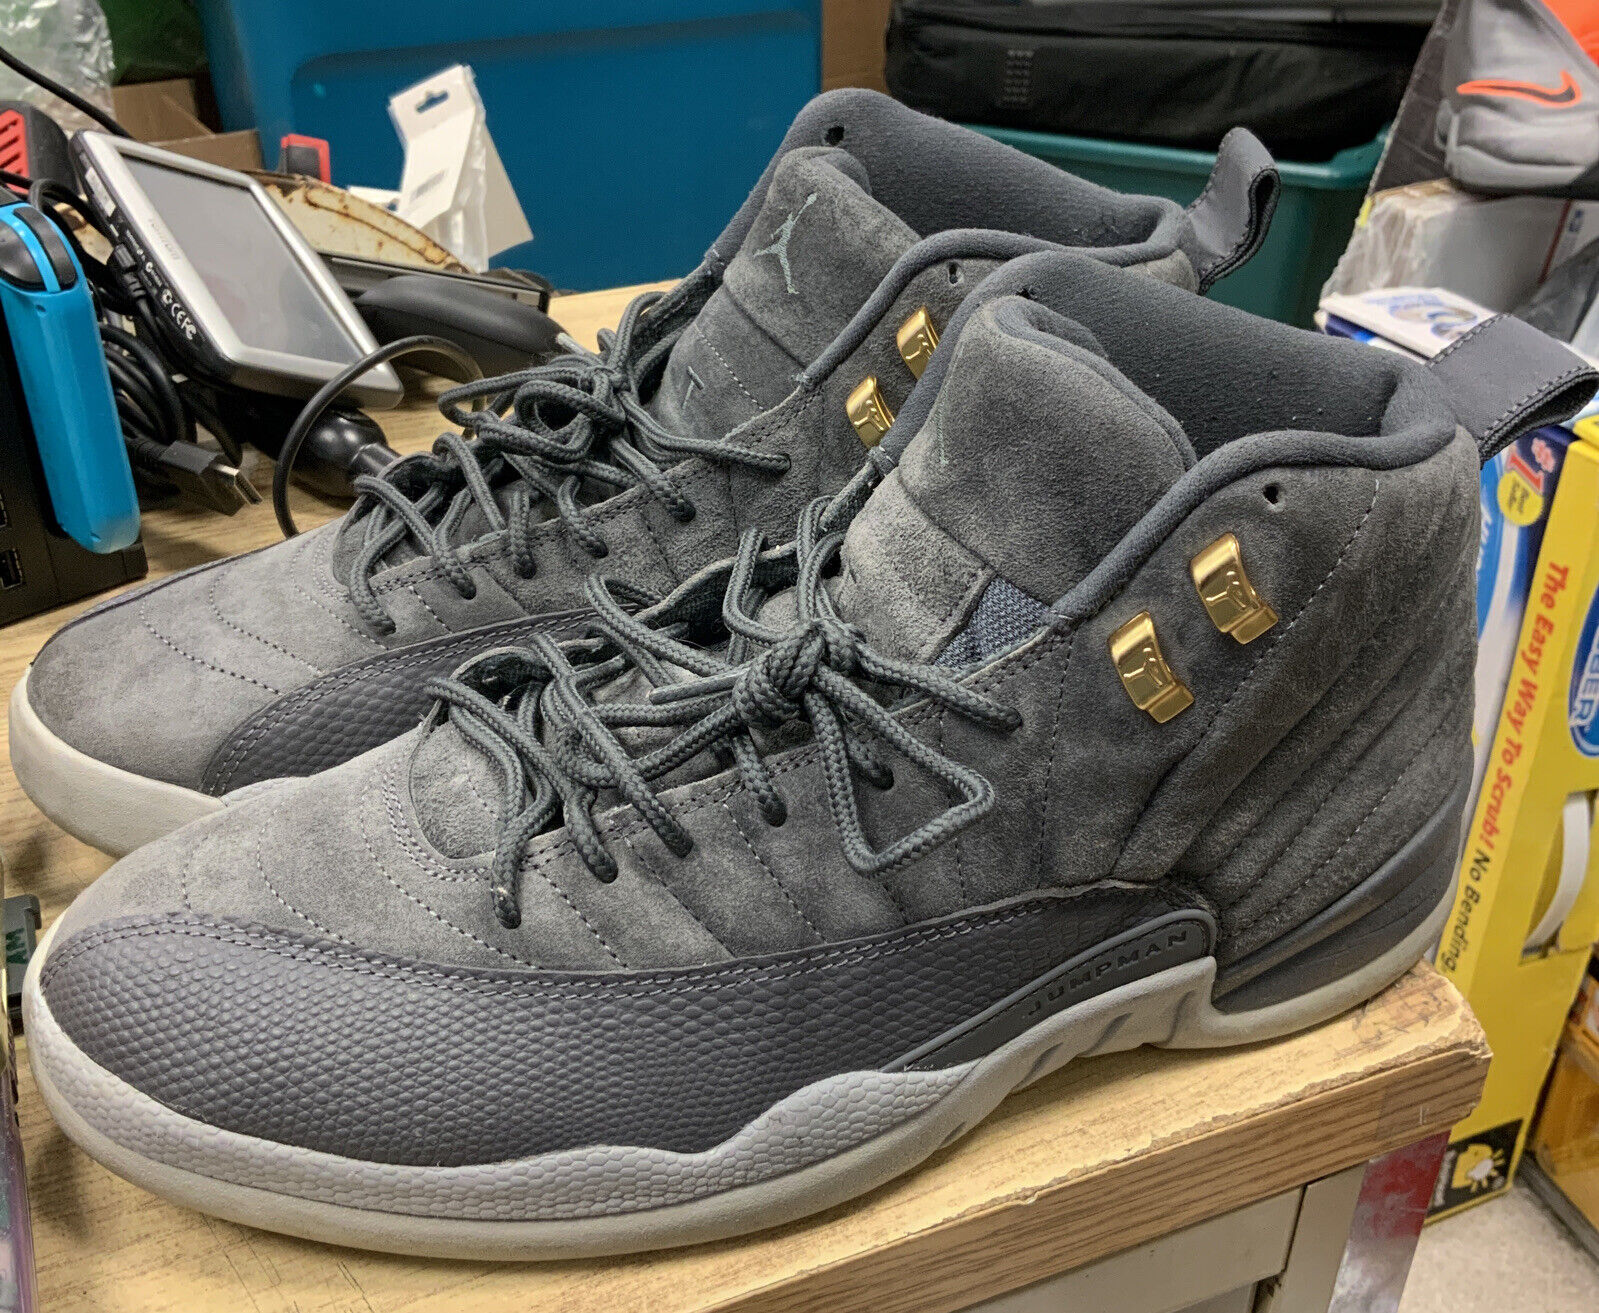 Nike Air Jordan 12 Retro XII Aj12 Dark Grey Suede Men Basketball ...